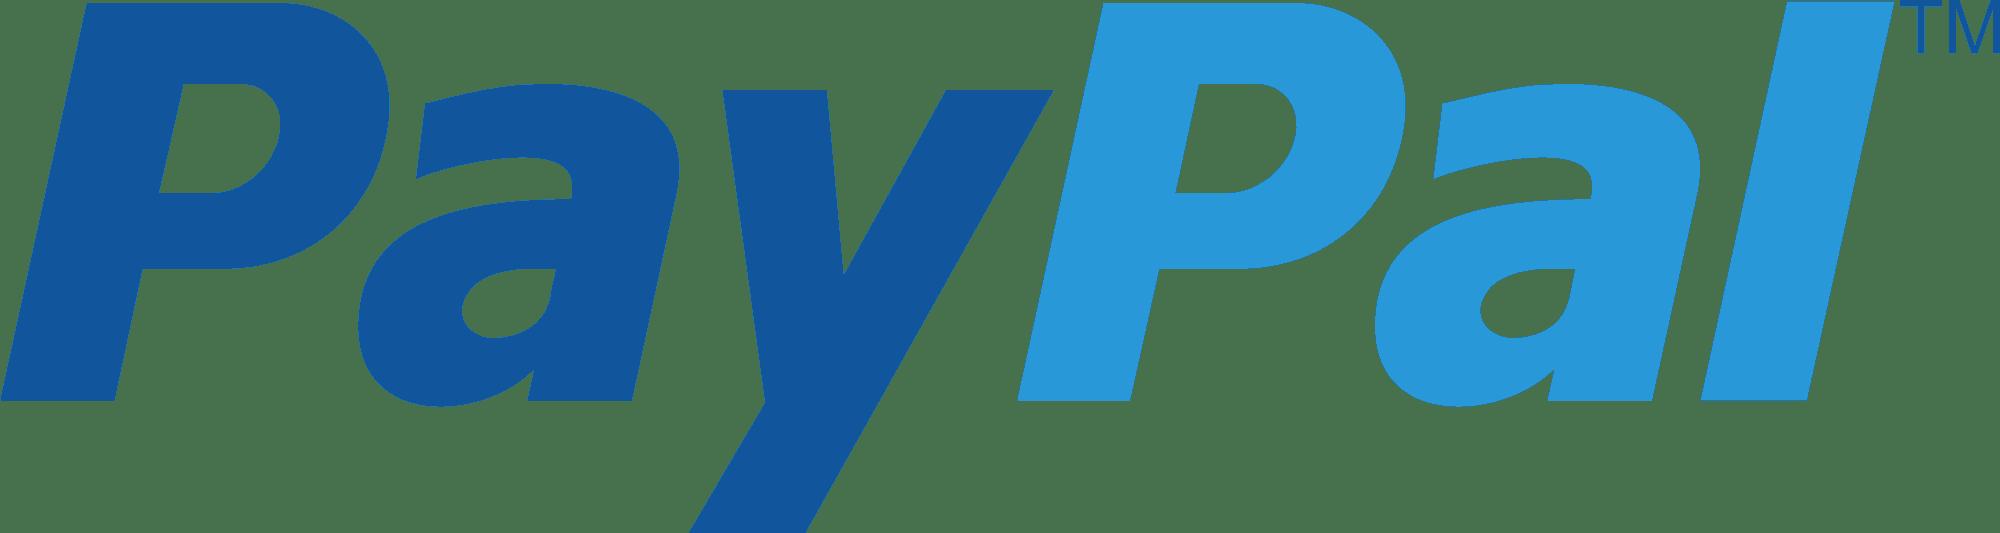 Paypal_logo-5